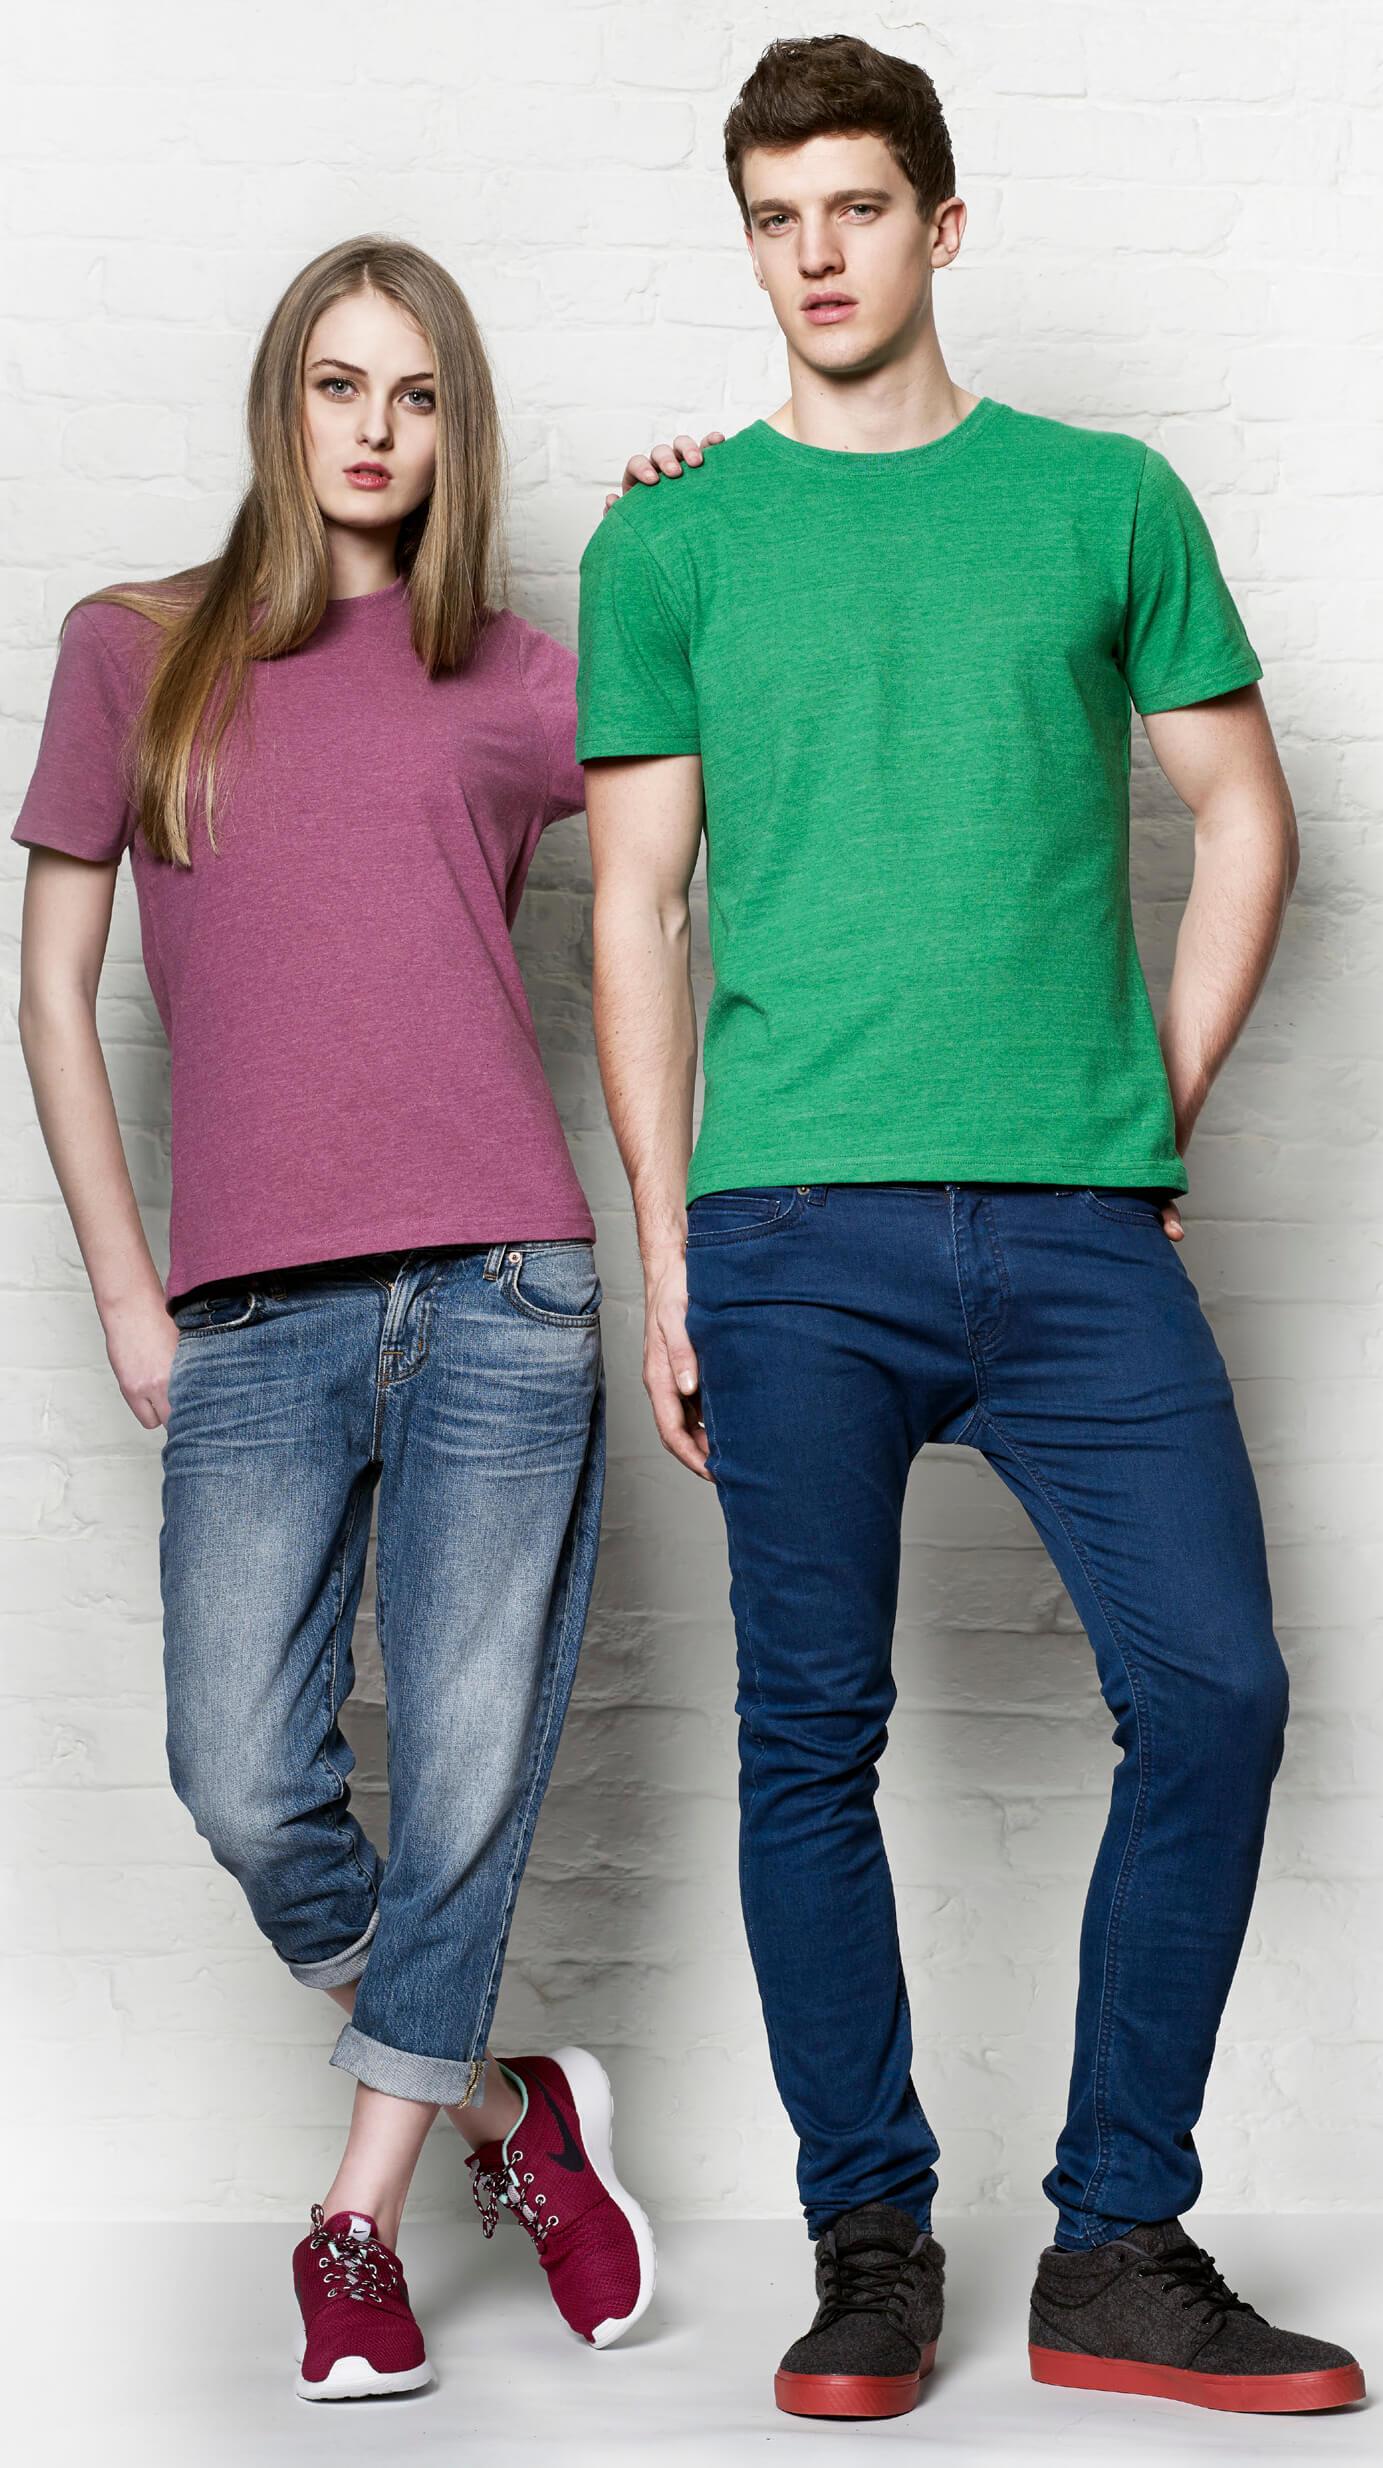 Druck auf 100% recyclebare T-Shirts